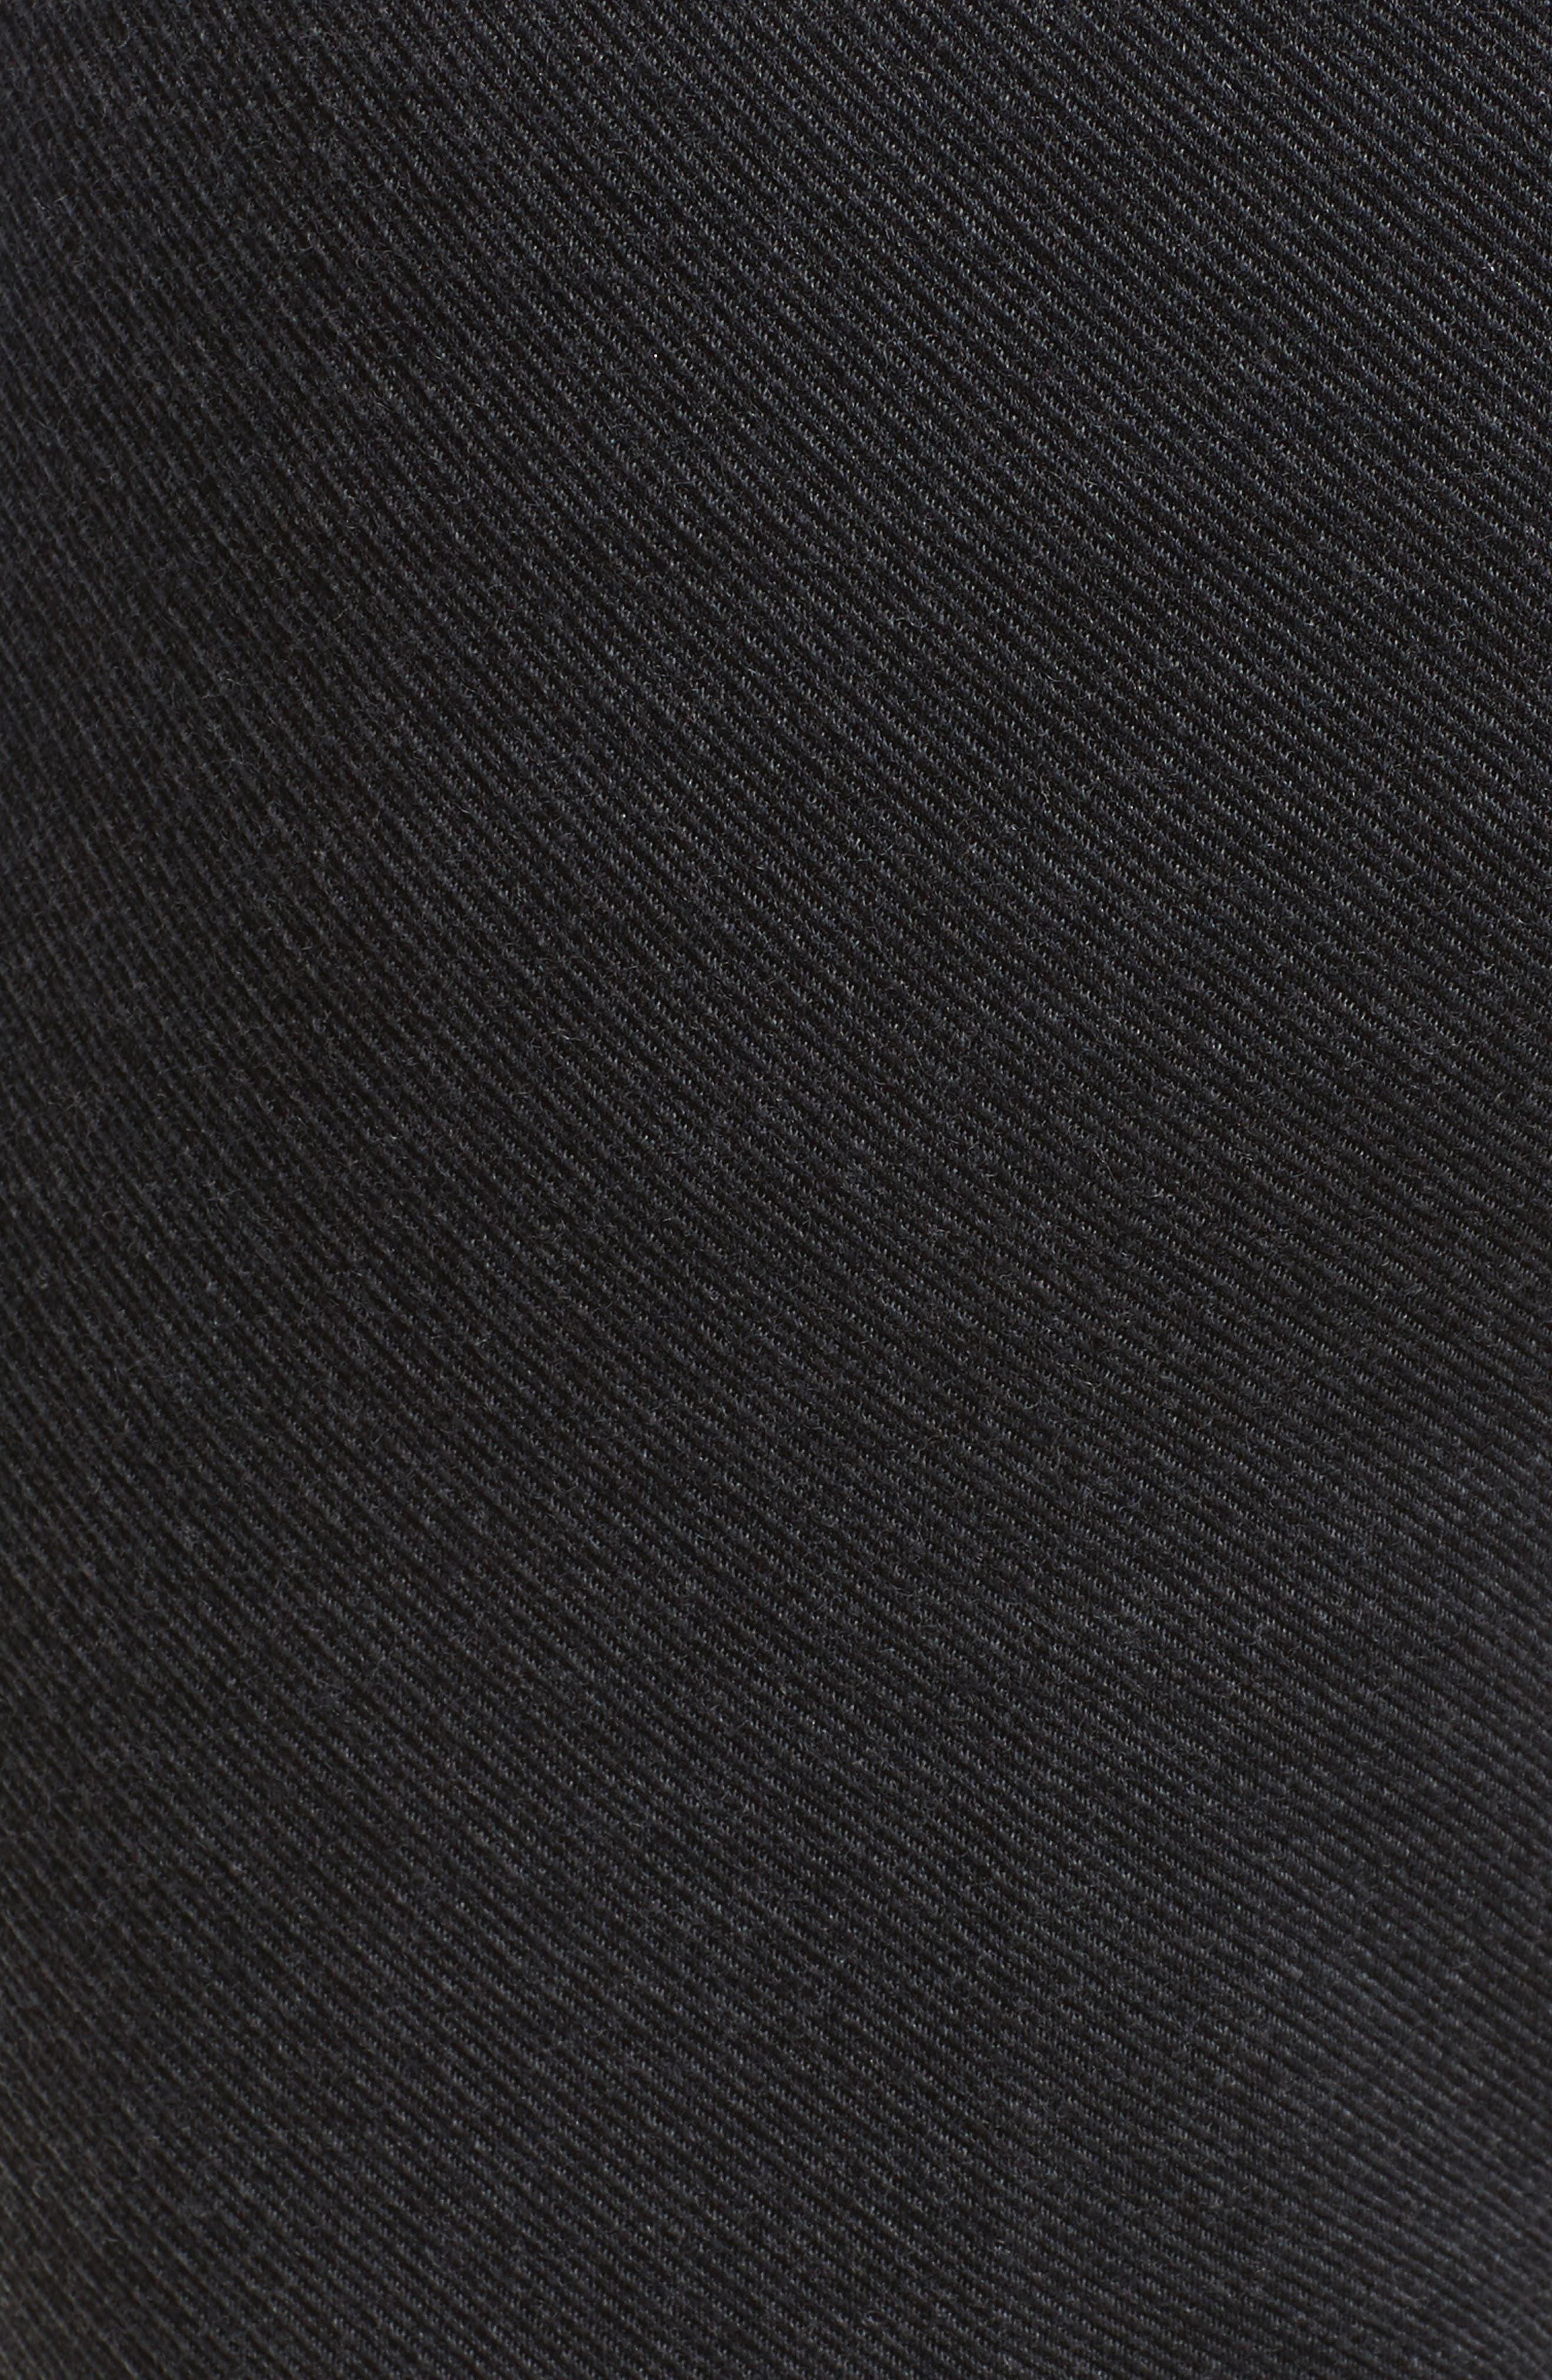 Pintuck Knit Twill Pants,                             Alternate thumbnail 5, color,                             029